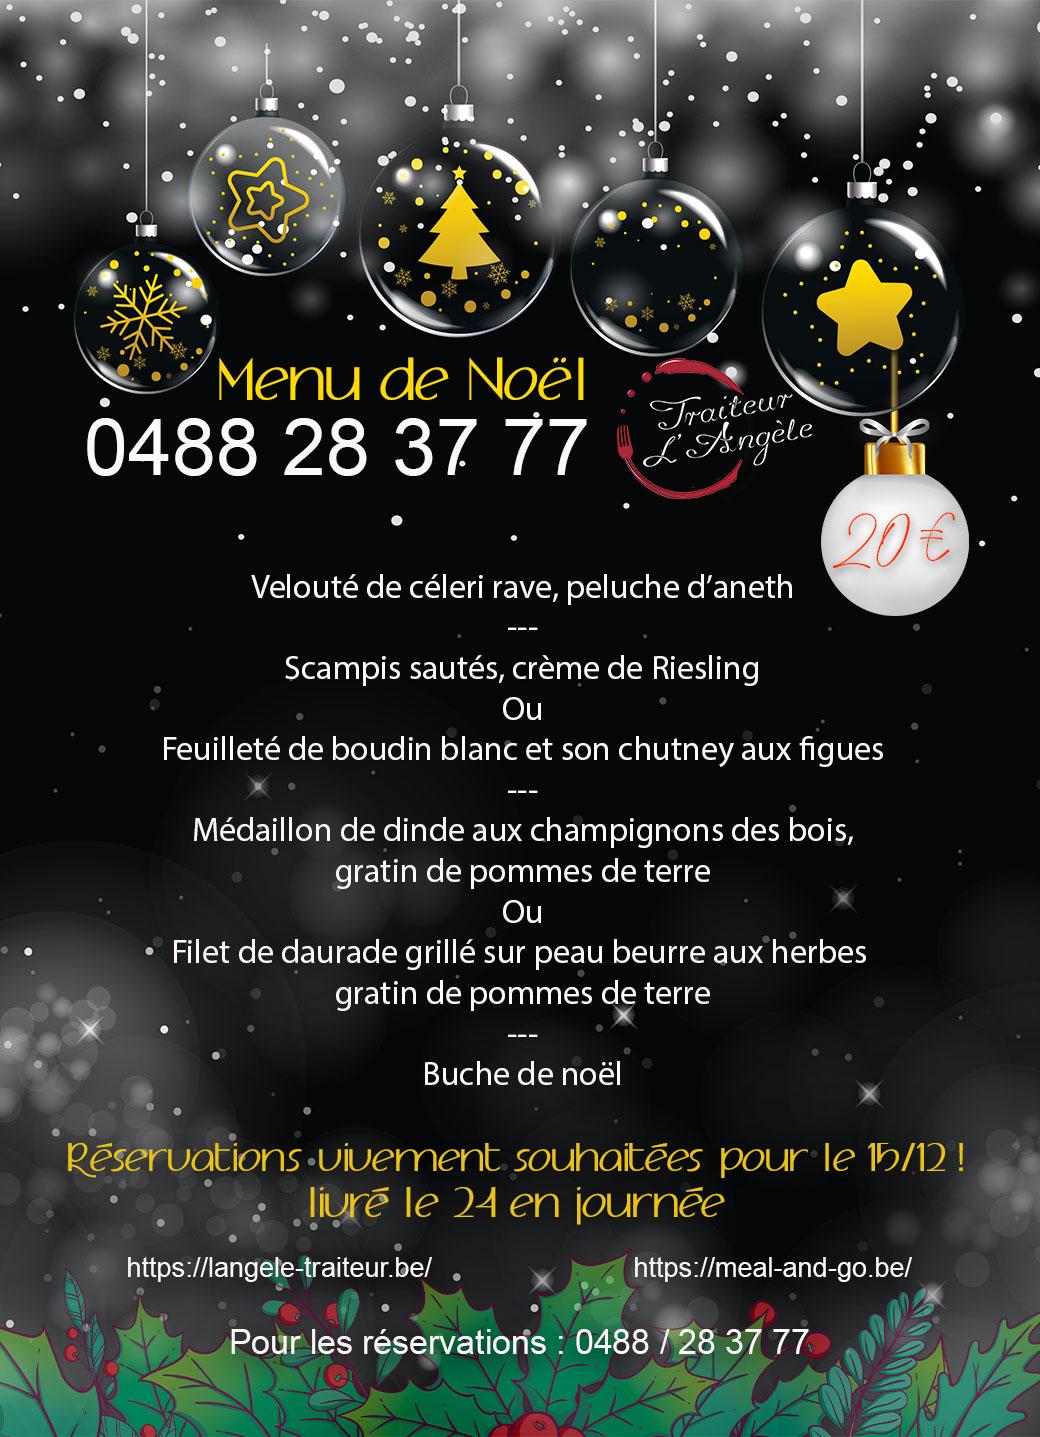 Menu de Noël Meal and go à Namur